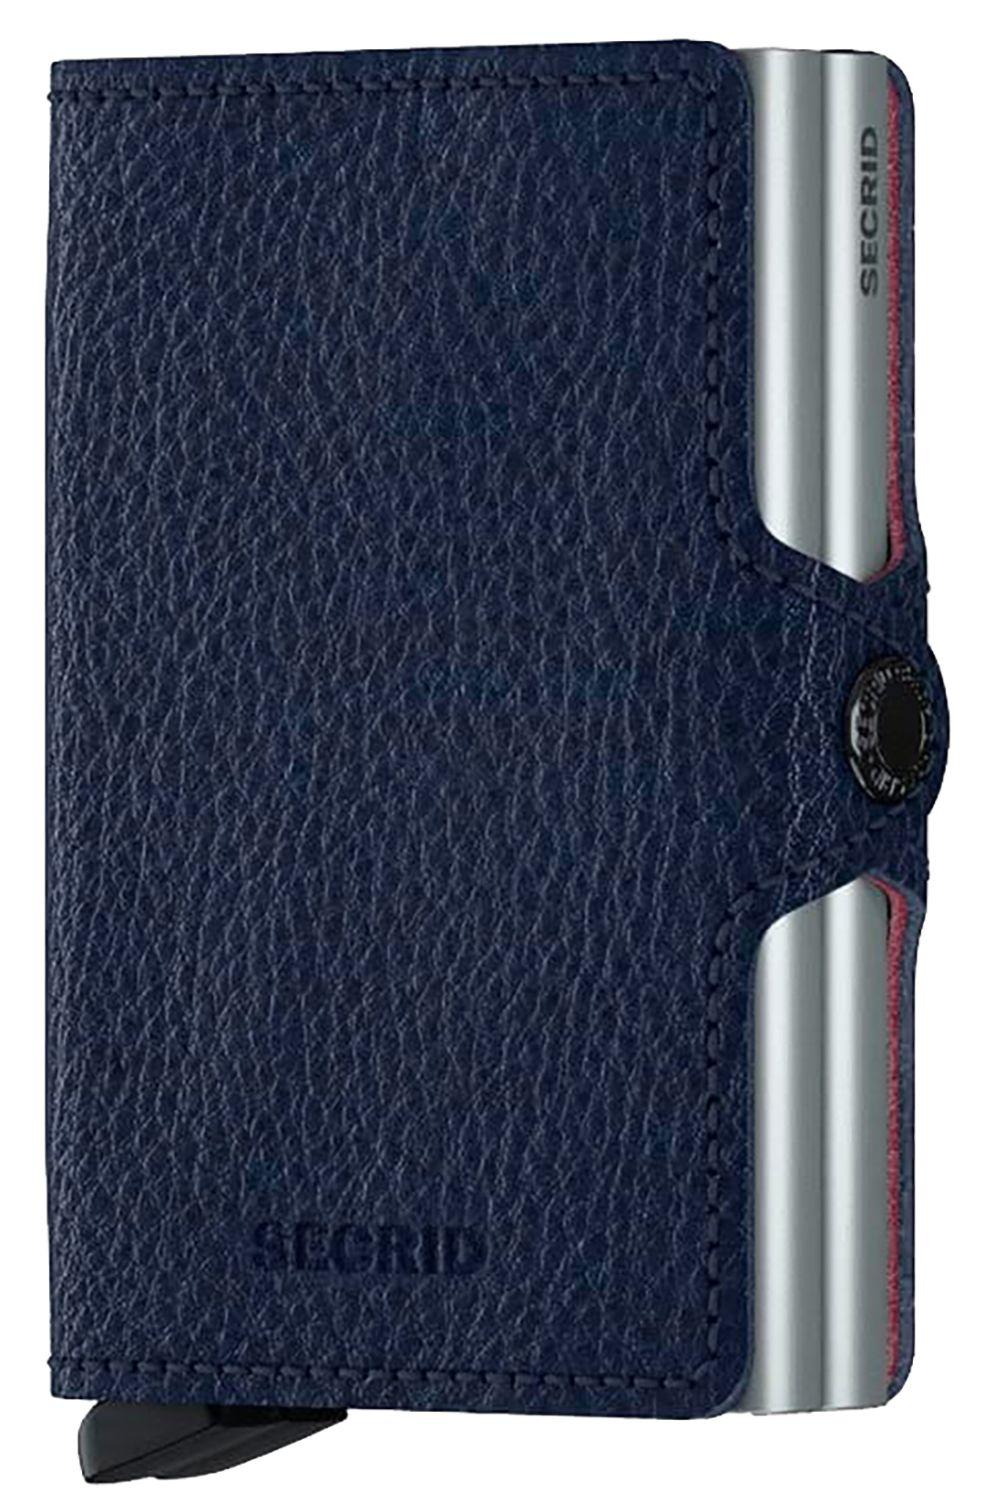 Secrid Leather Wallet TWINWALLET VEG TANNED Navy